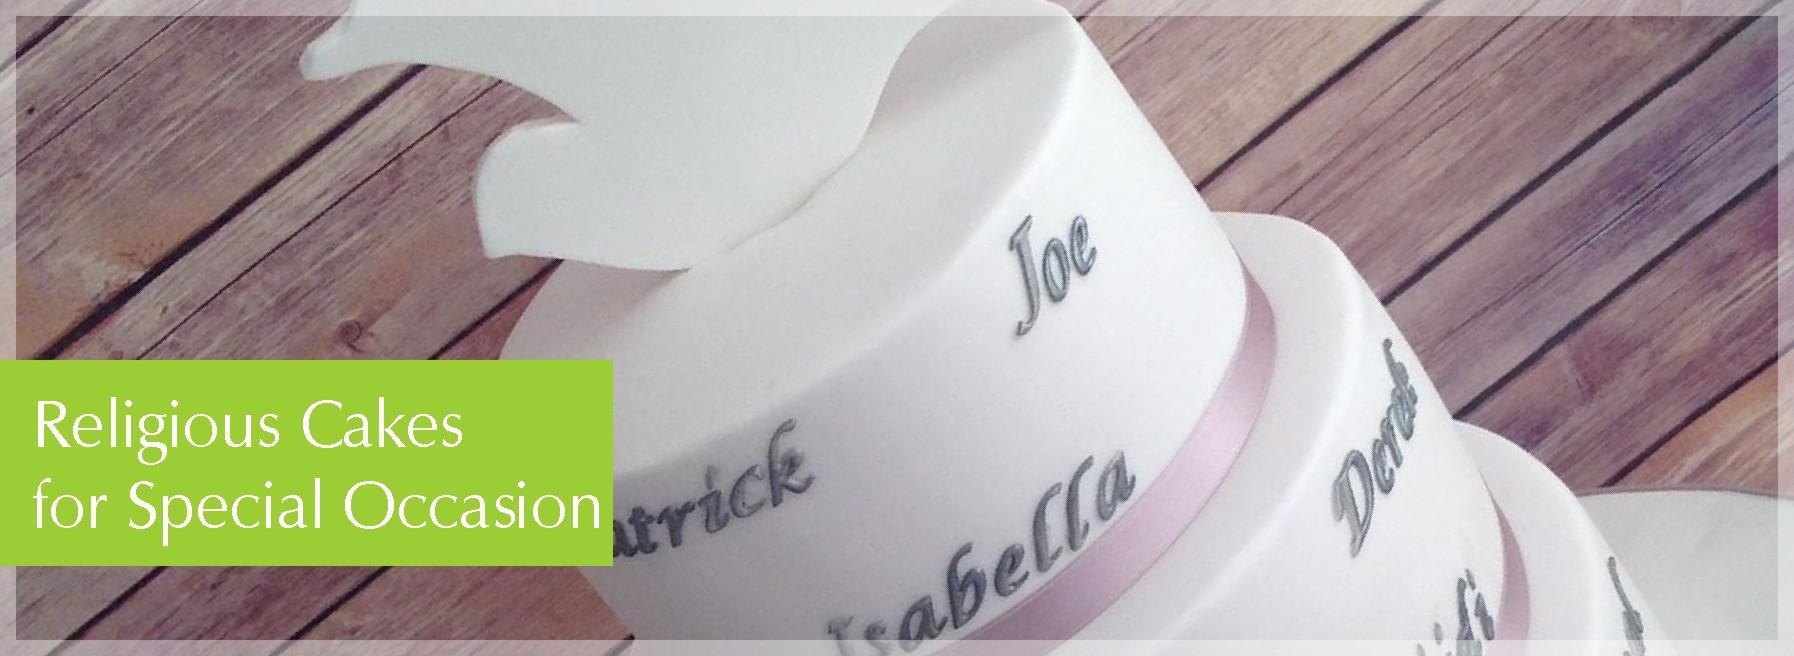 religious cakes header